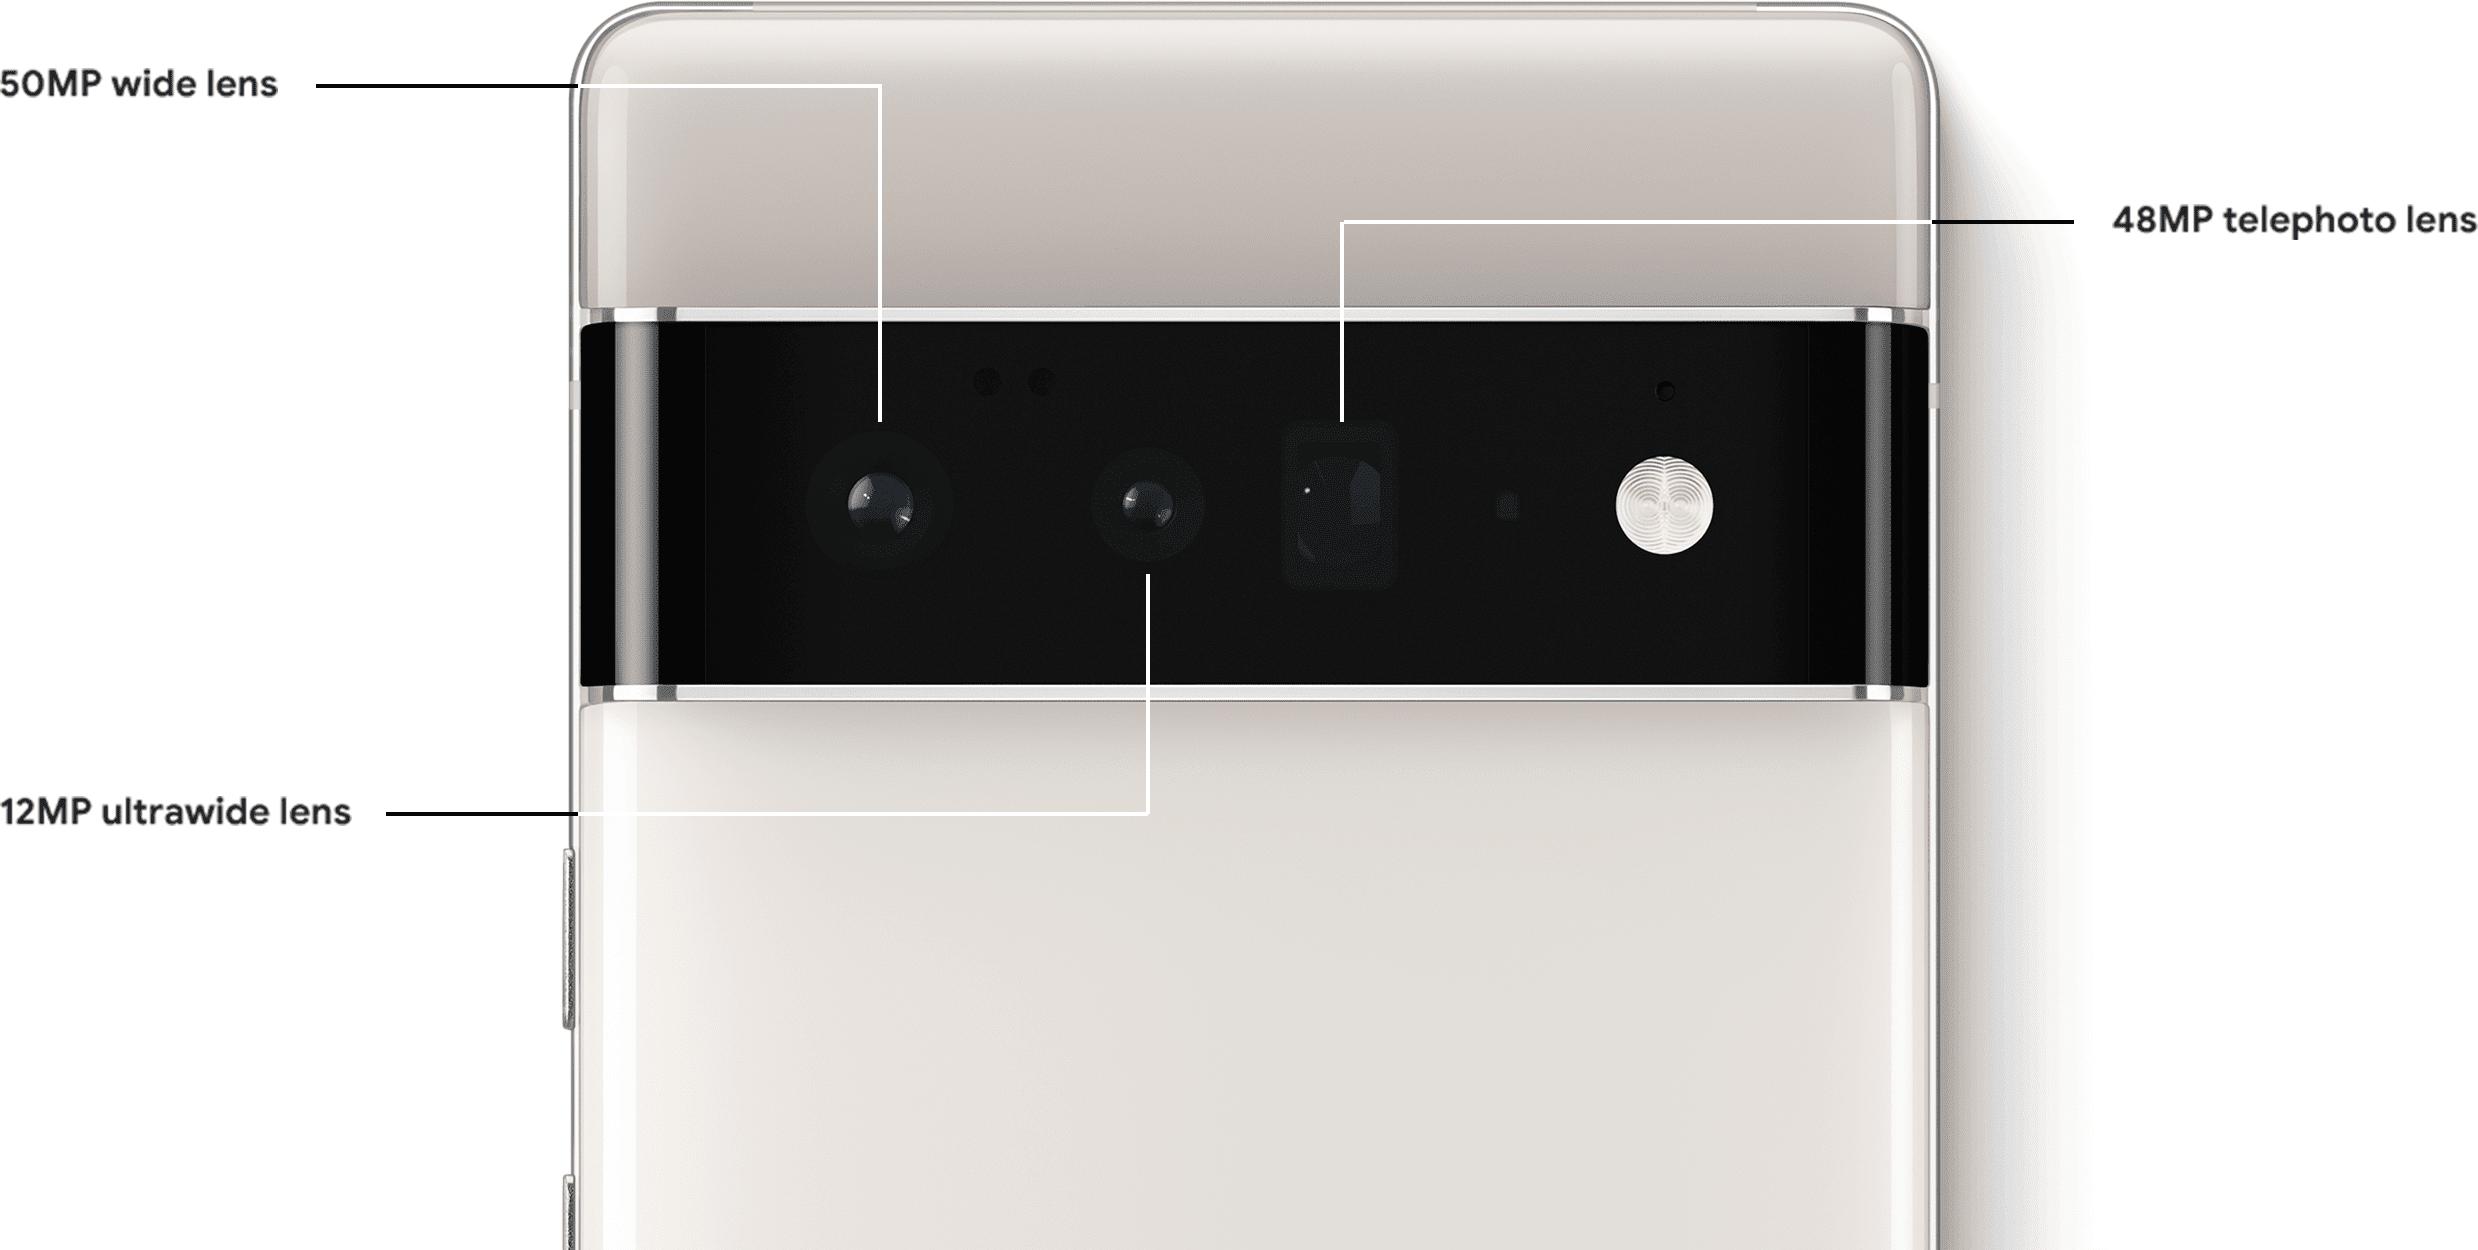 Pixel 6 Pro cameras